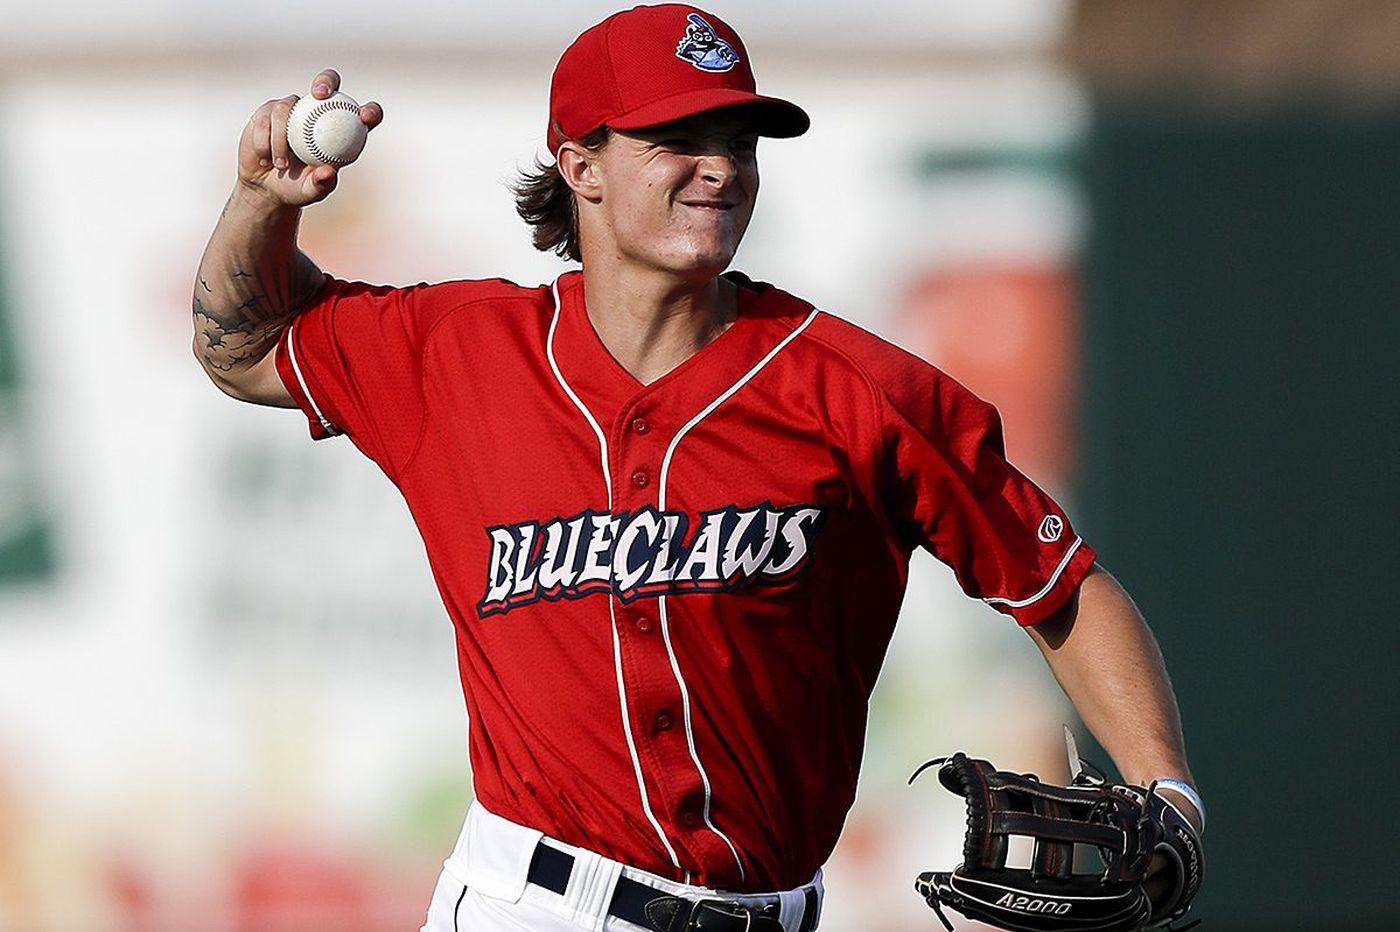 Baseball America drops Phillies prospect Mickey Moniak from top 100 list